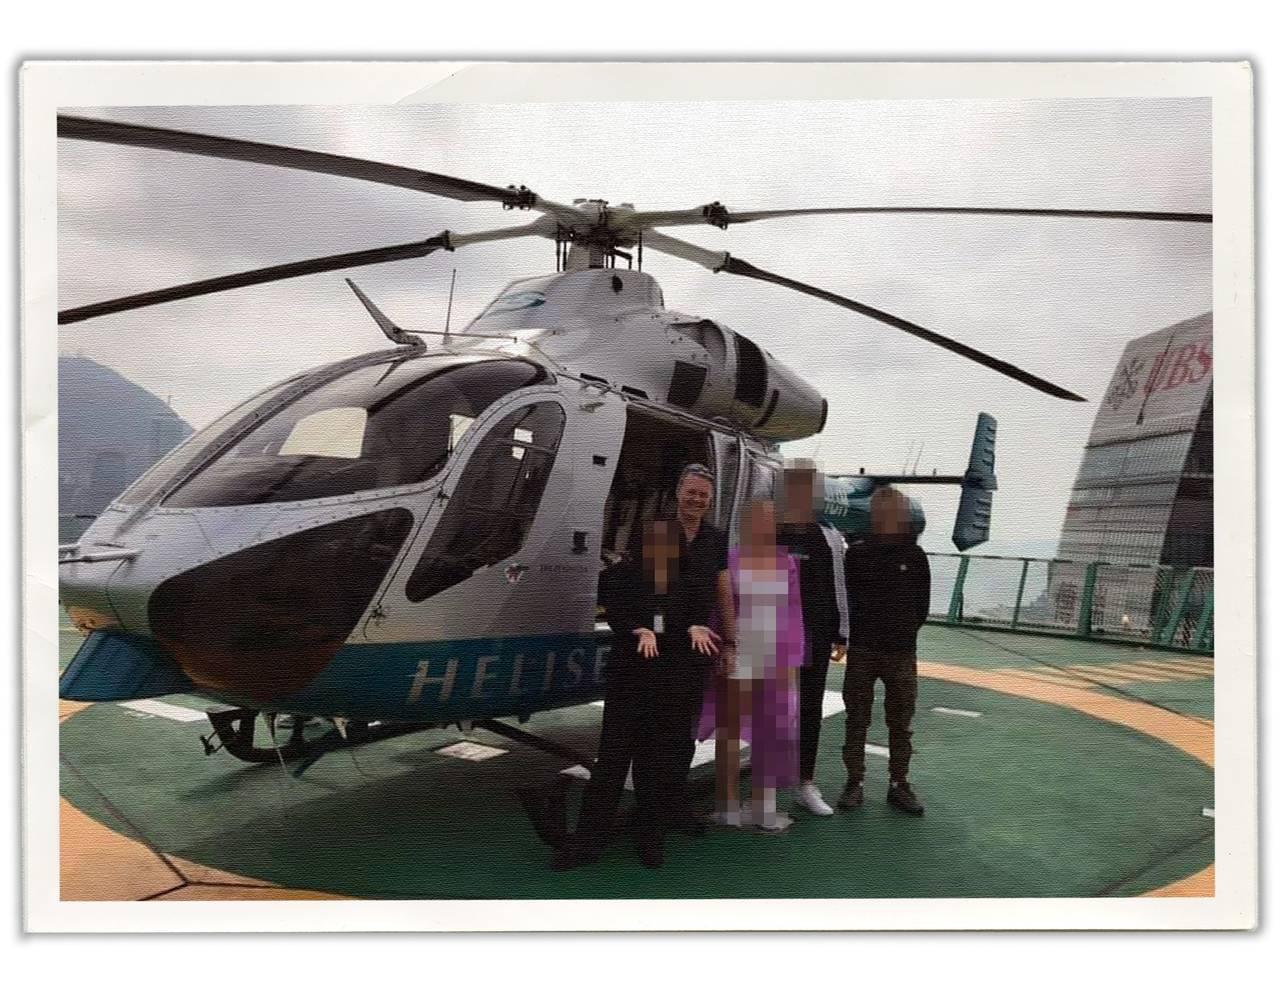 Jan Helge på helikoptertur